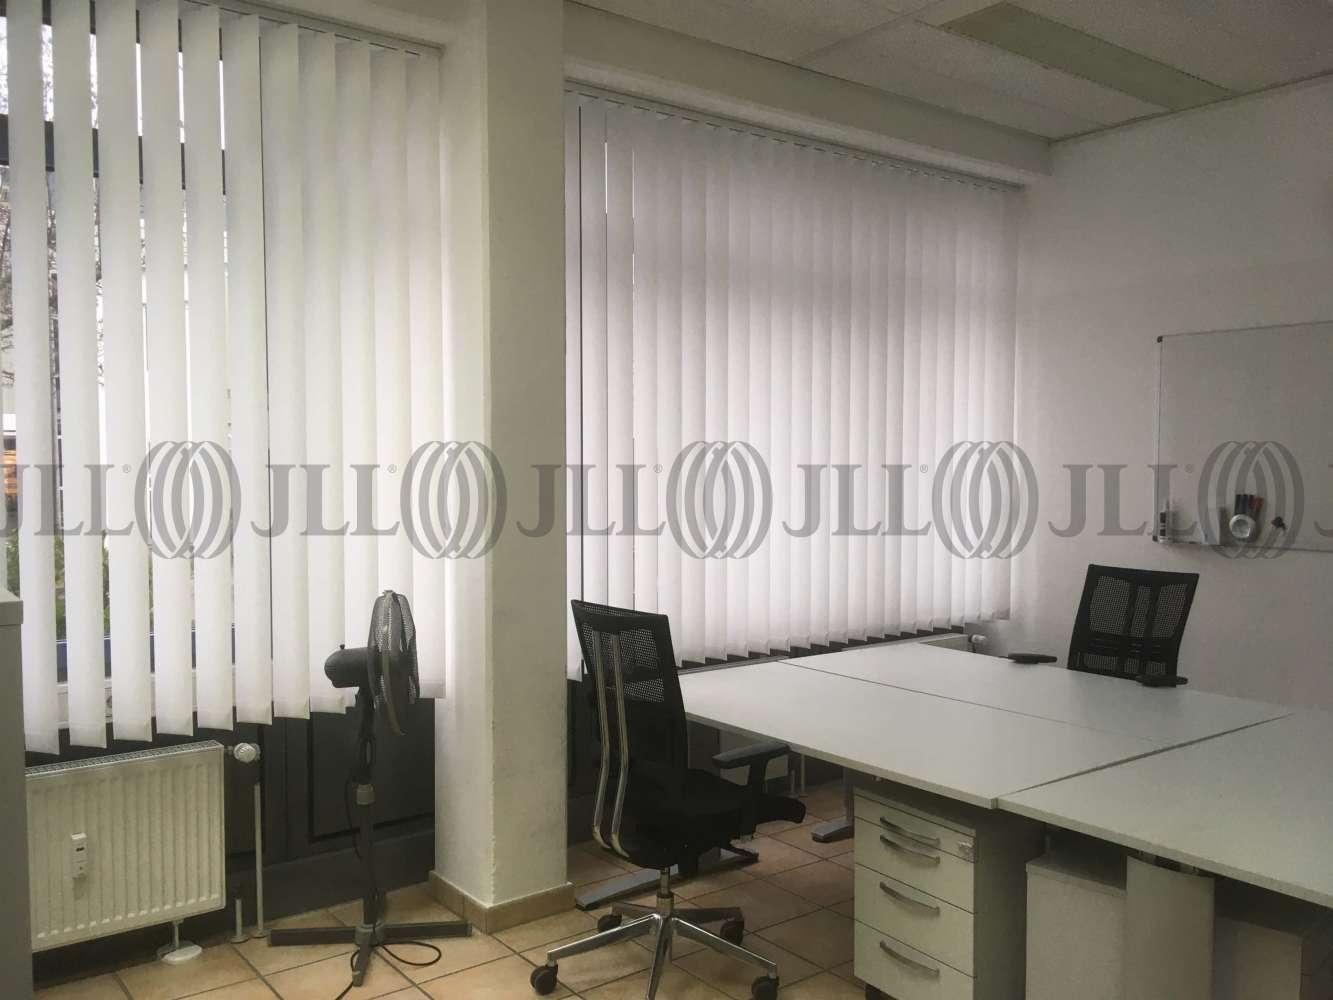 Büros Leinfelden-echterdingen, 70771 - Büro - Leinfelden-Echterdingen, Echterdingen - S0076 - 10905754